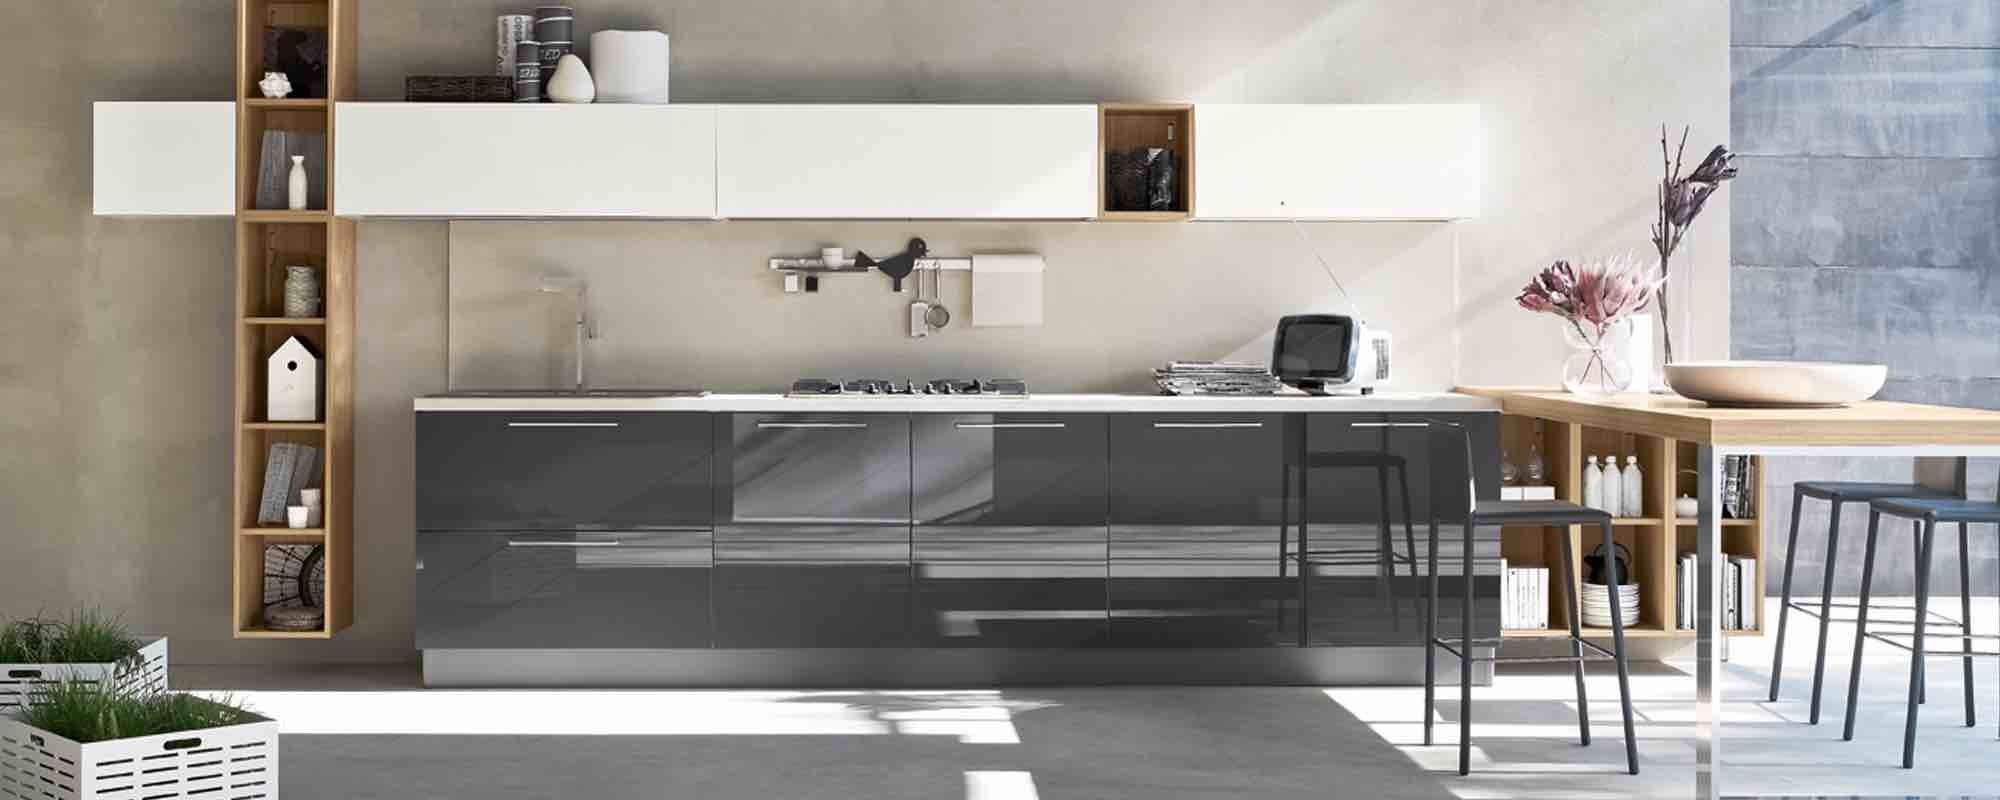 cucine moderne stosa - modello cucina aleve 05 | cucina ... - Cucina Febal Light La Qualita Accessibile